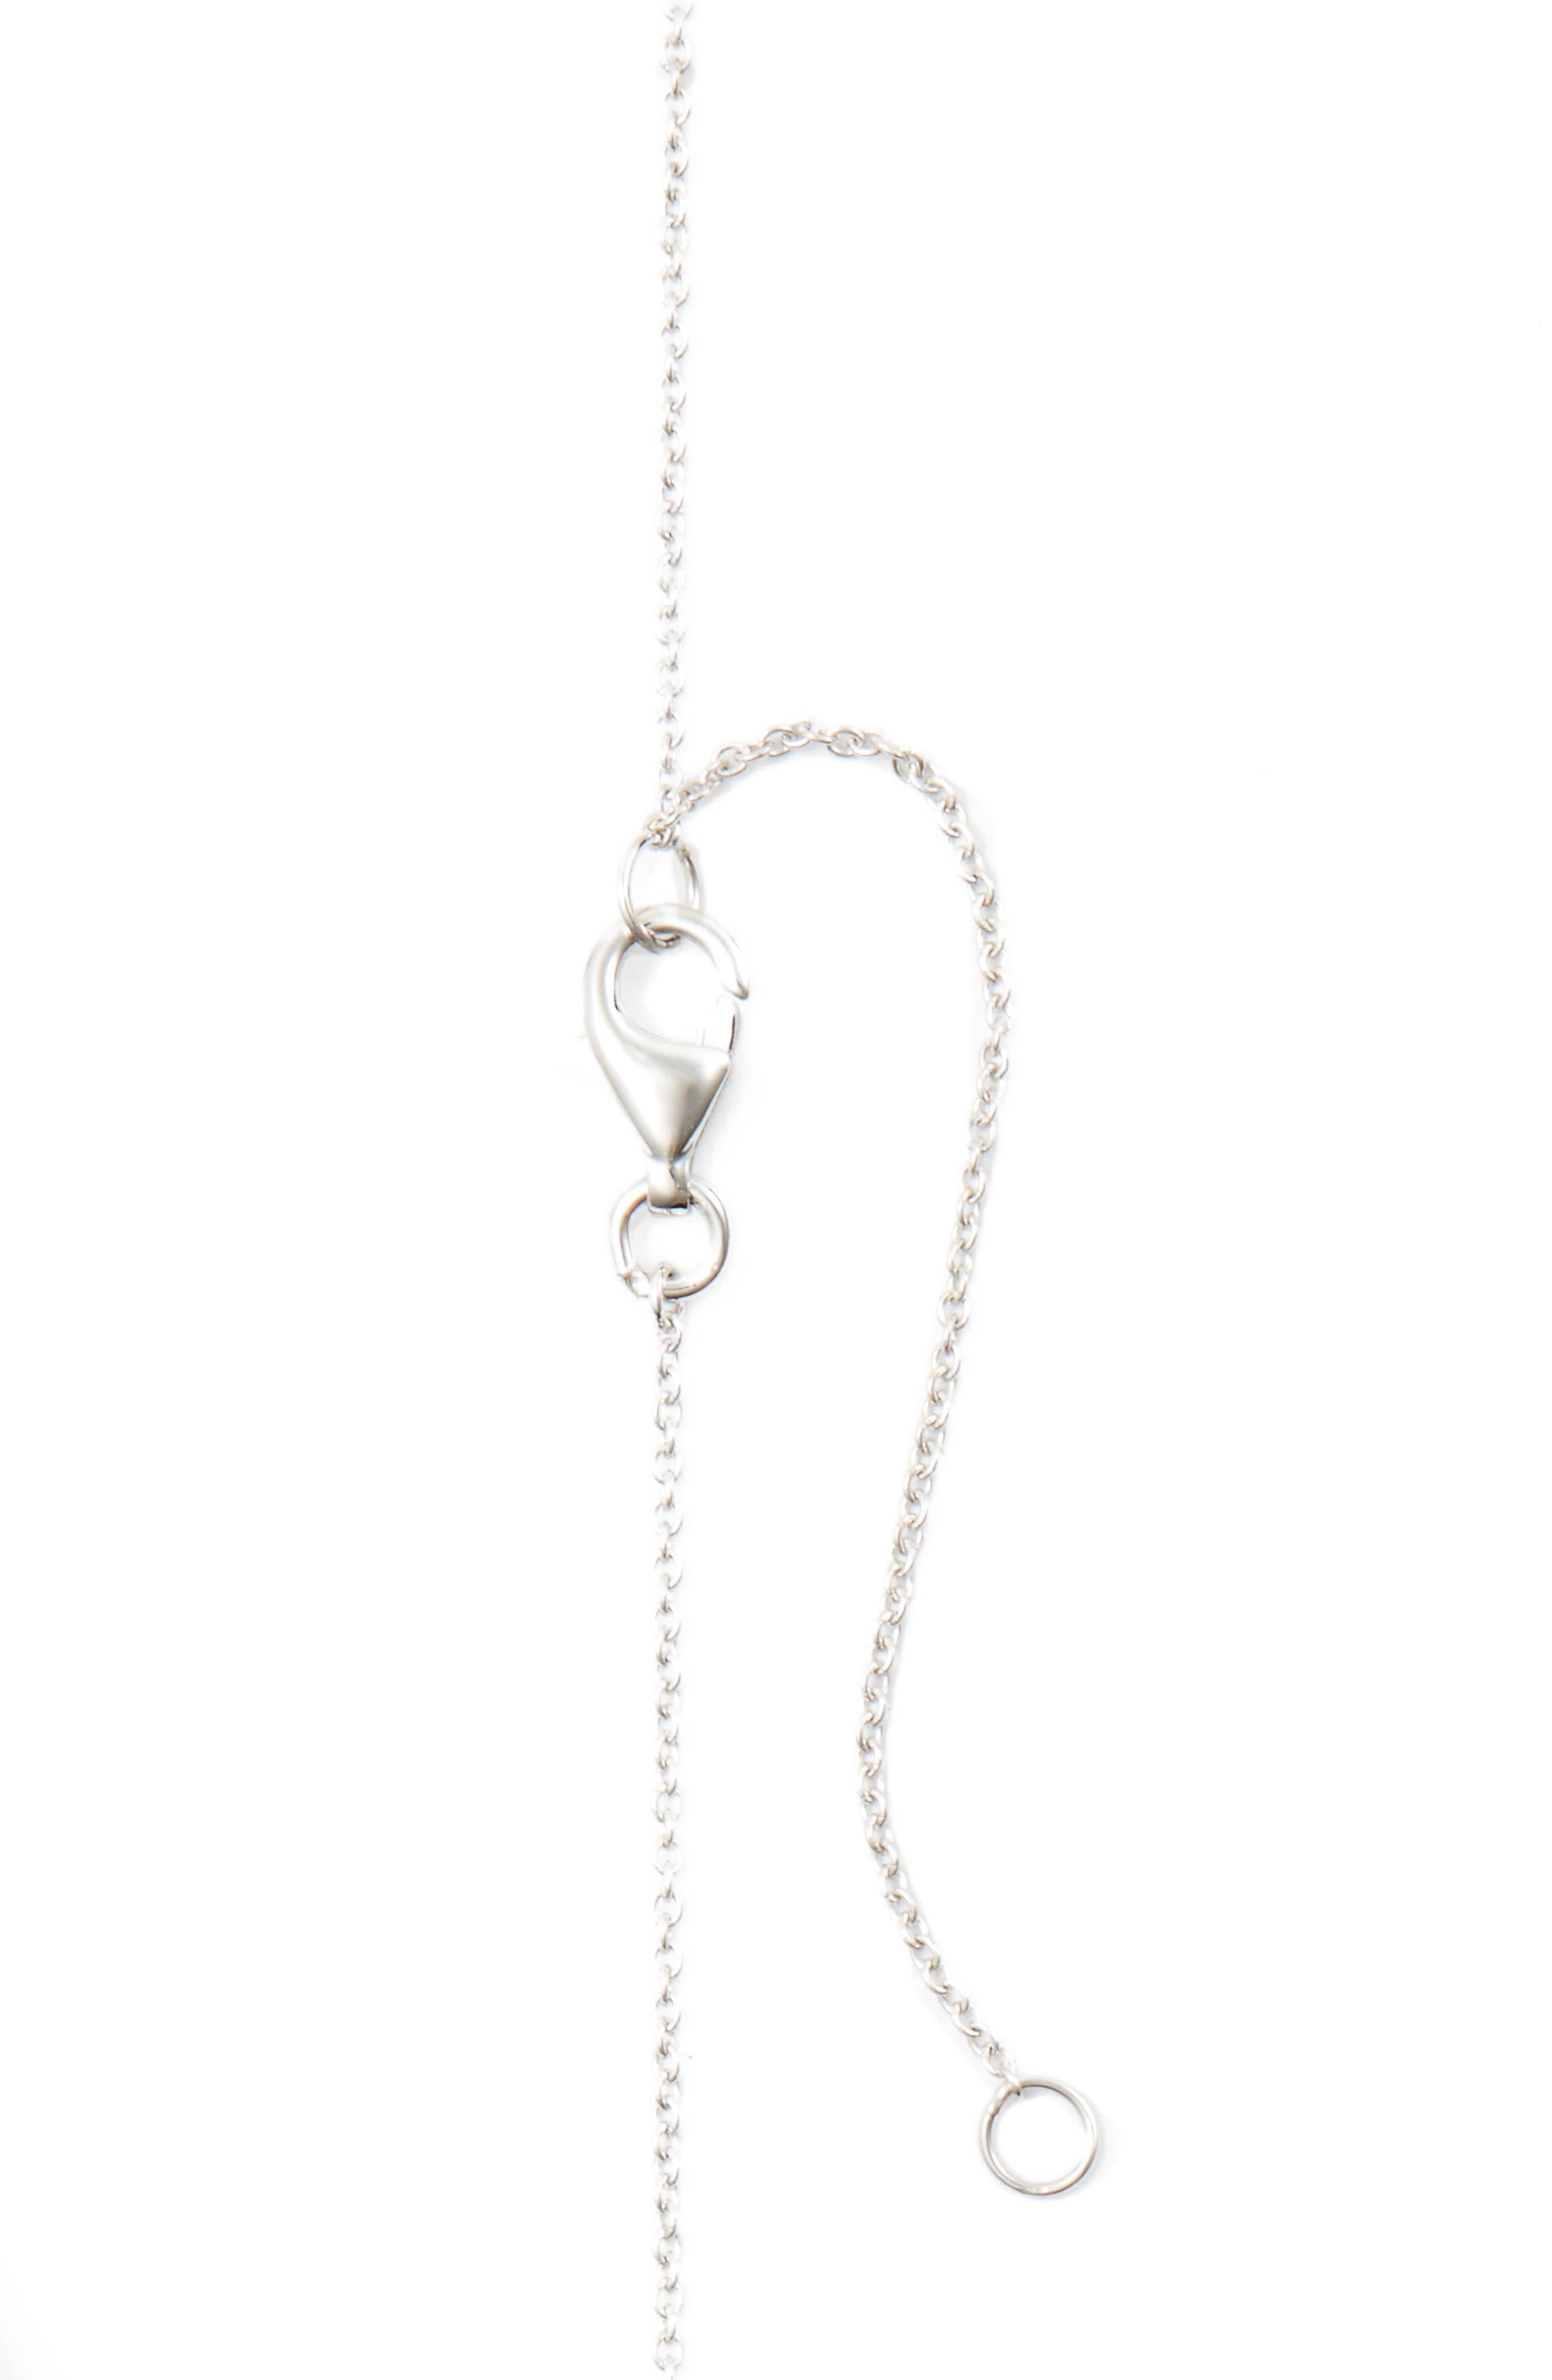 Three Triangle Diamond Pendant Necklace,                             Alternate thumbnail 3, color,                             WHITE GOLD